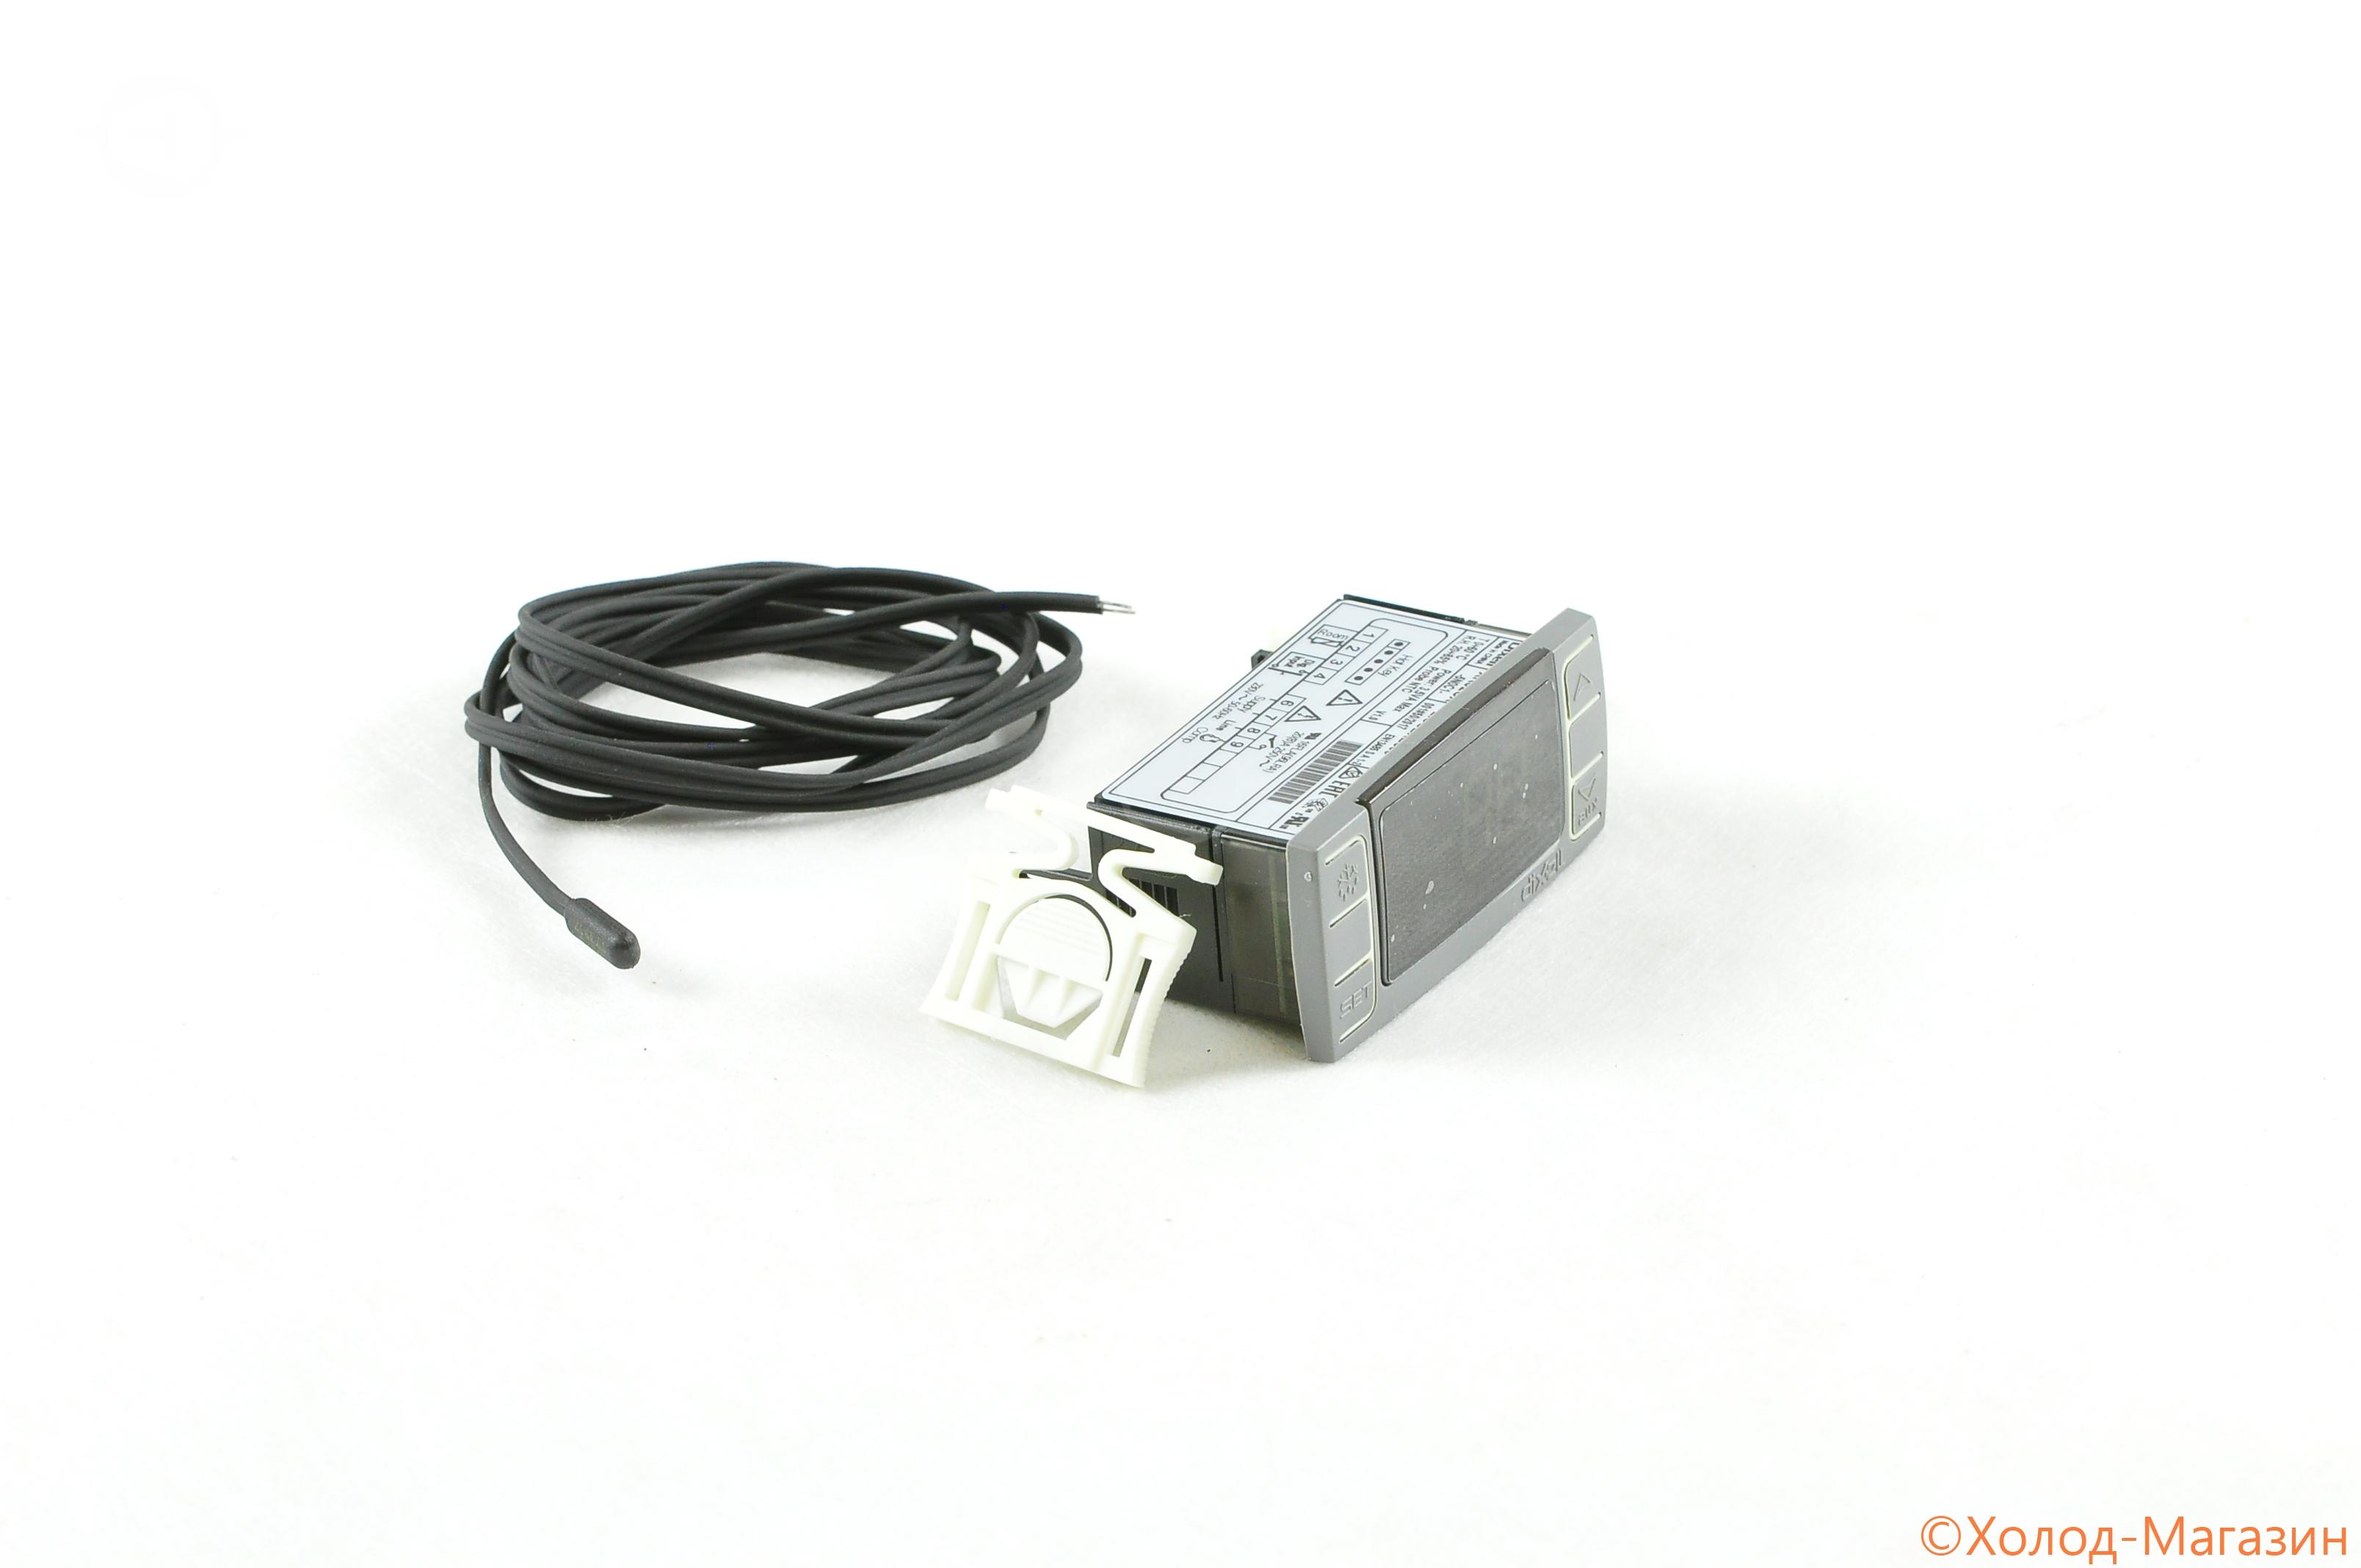 Контроллер Dixell XR02CX -5N0C1 NTC R=20A +1NG6/1,5MT